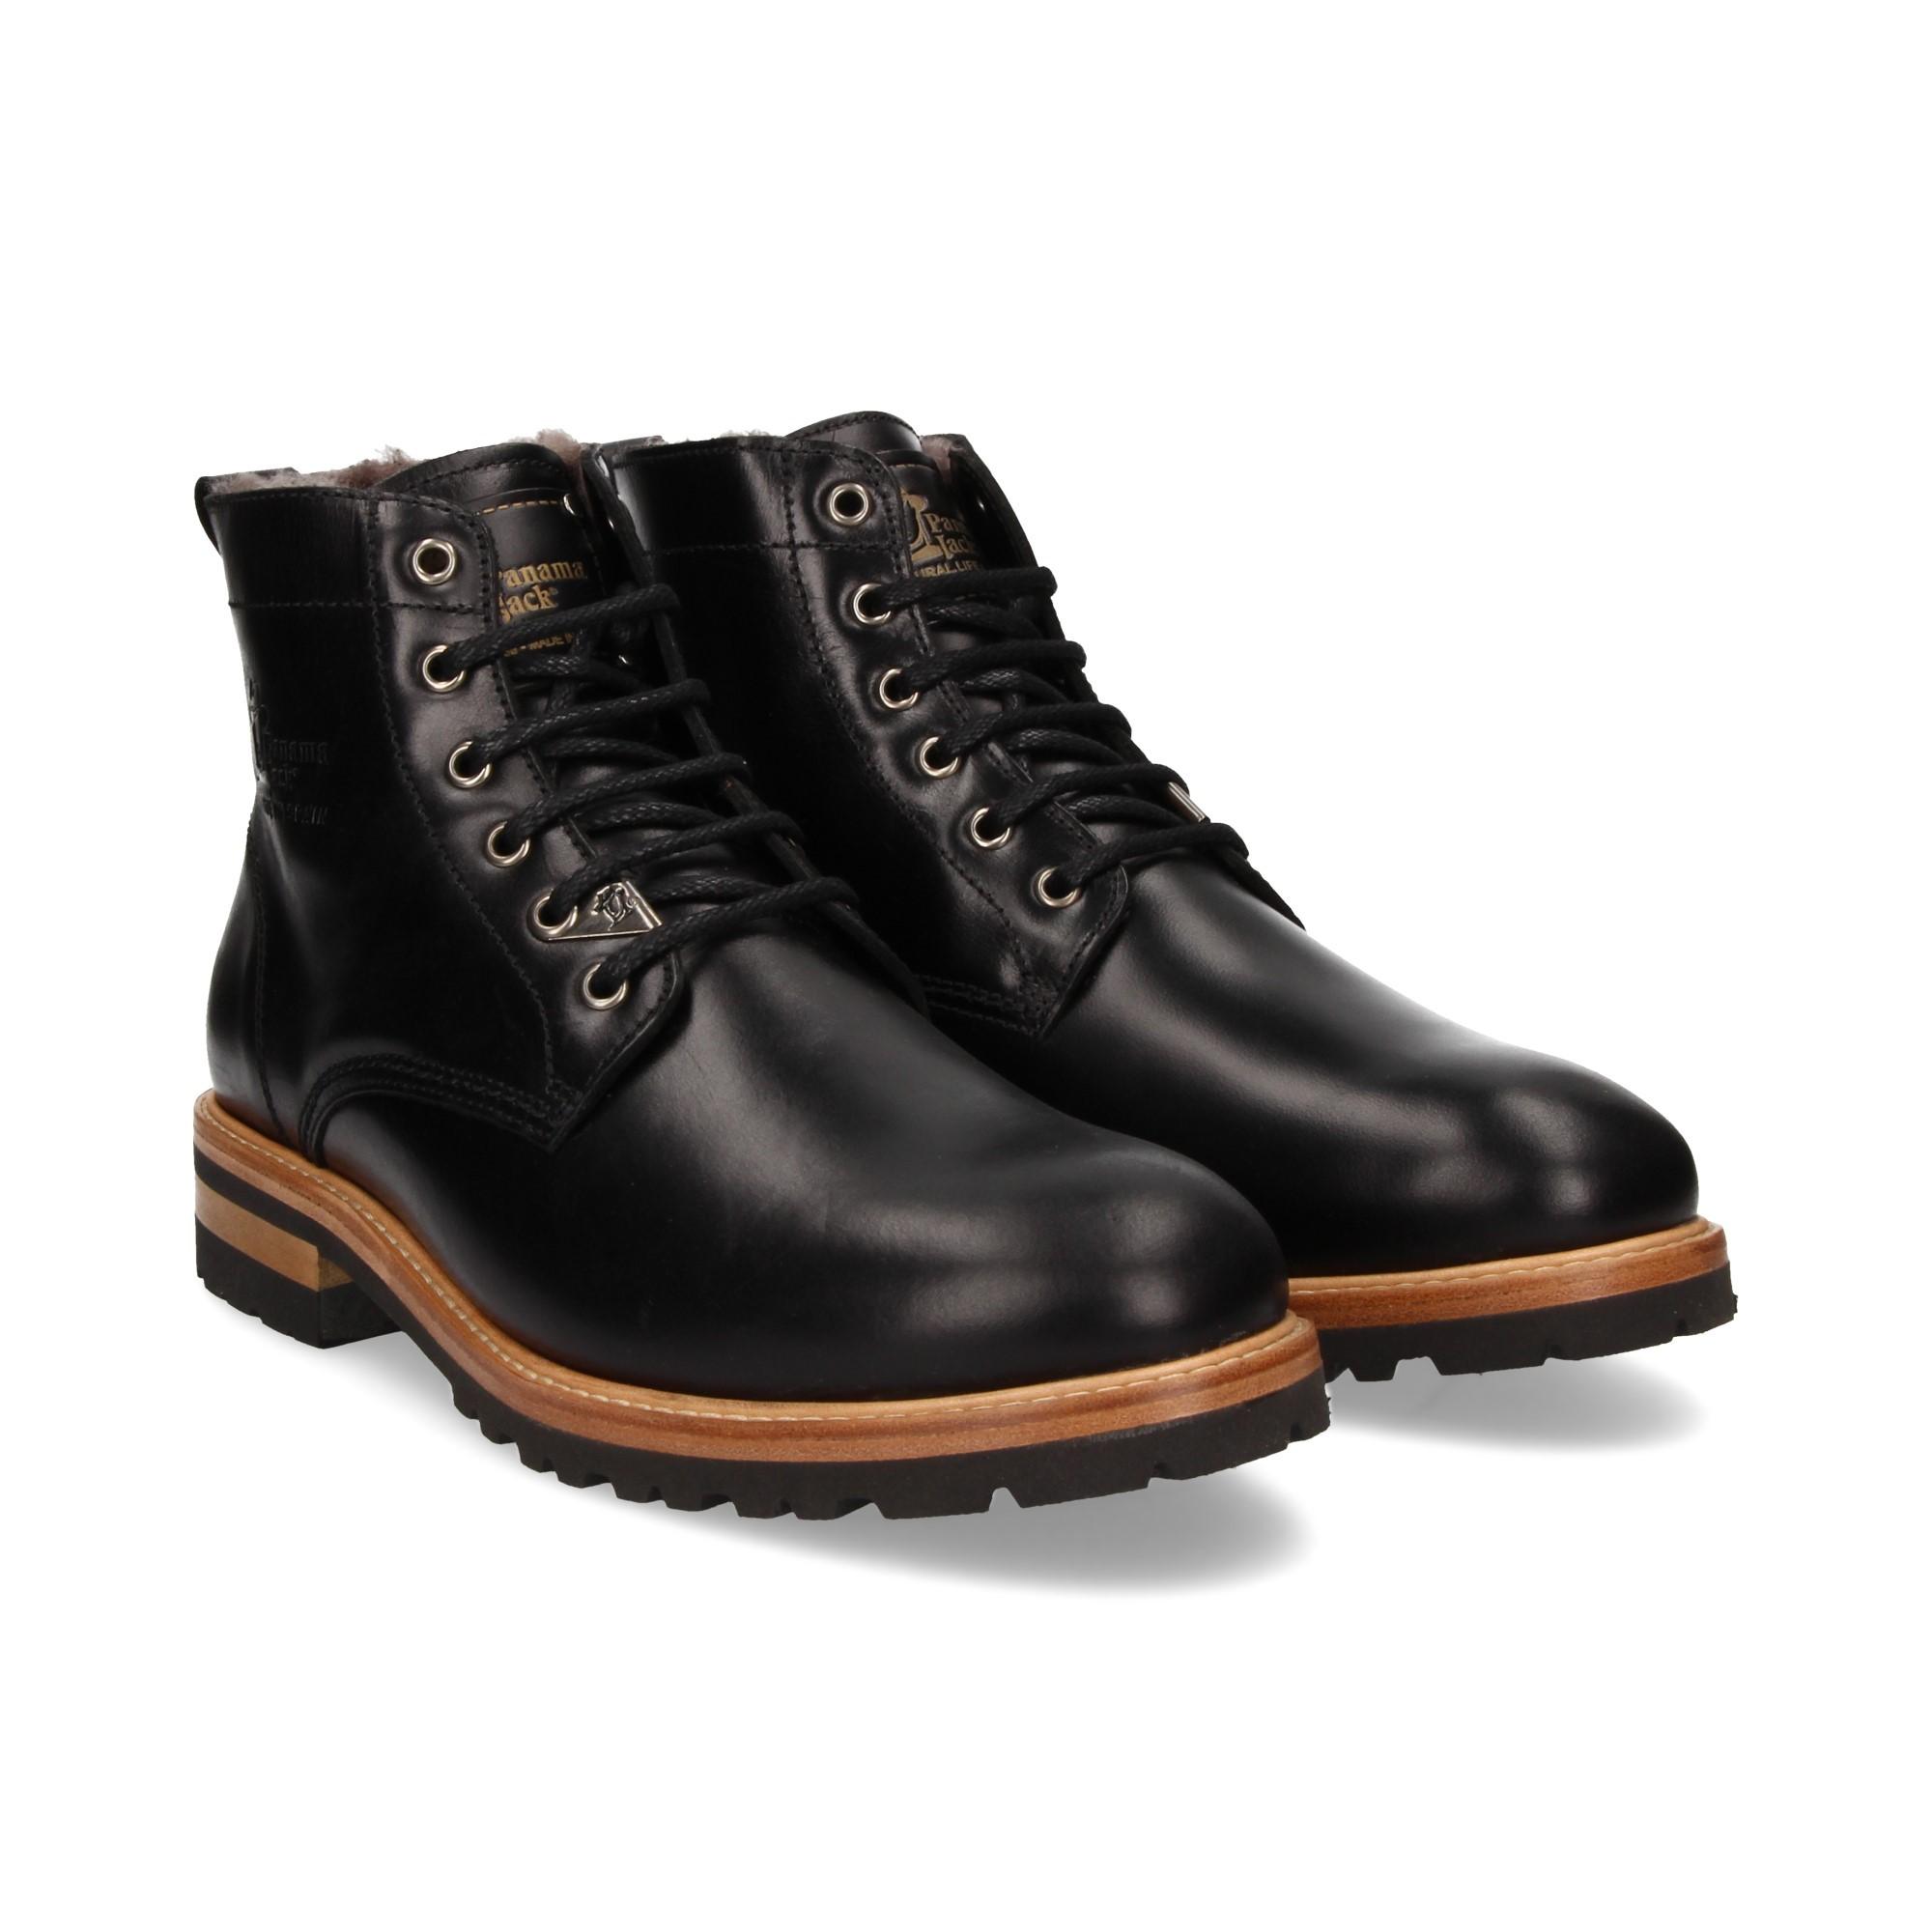 f0565e84a29a24 PANAMA JACK Men s Ankle Boots EMERY C3 NAPA NEGRO